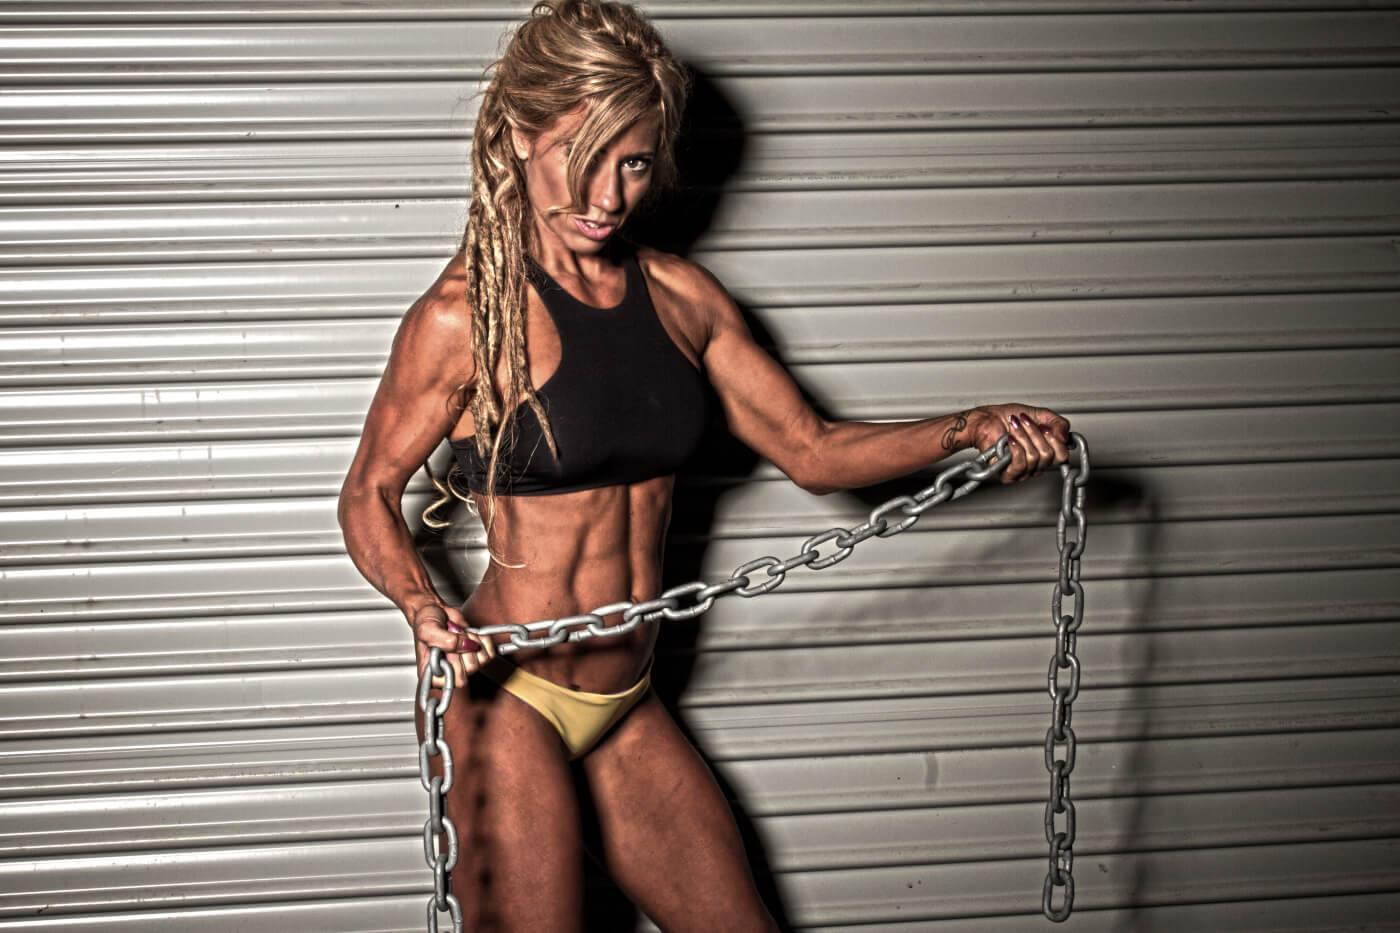 Australian Vegan Bodybuilder Cuts Winning Figure At Arnold Classic News Peta Australia